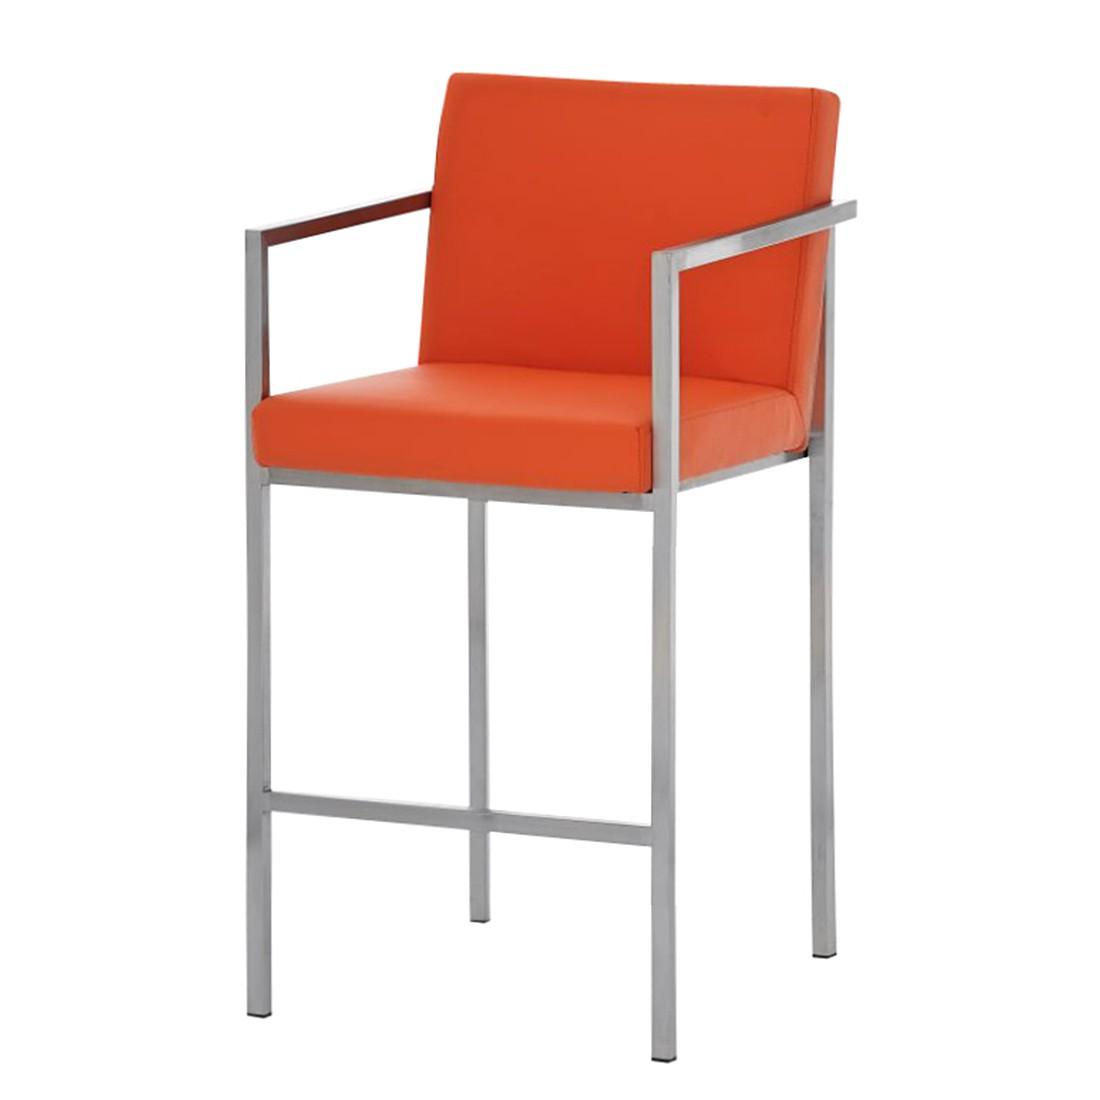 Barhocker Atlantic – Orange -Edelstahl/Kunstleder, CLP kaufen